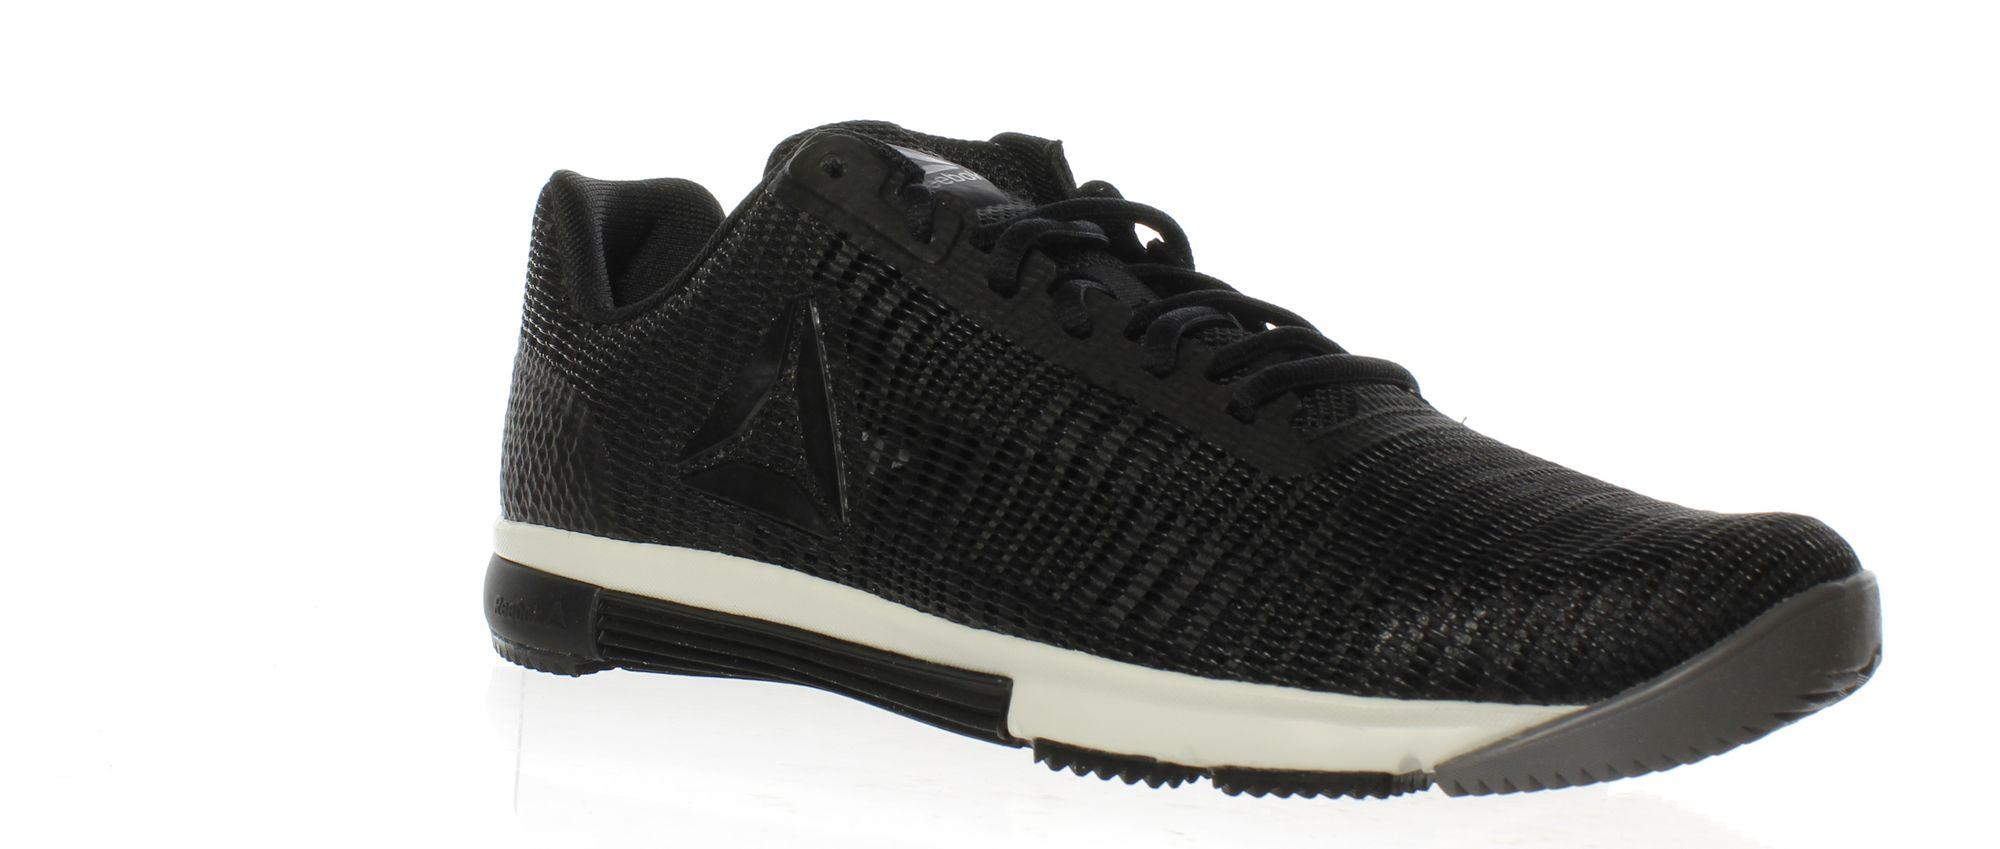 Reebok-Mens-Athletic-Speed-TR-Flexweave-Cross-Training-Shoes thumbnail 6